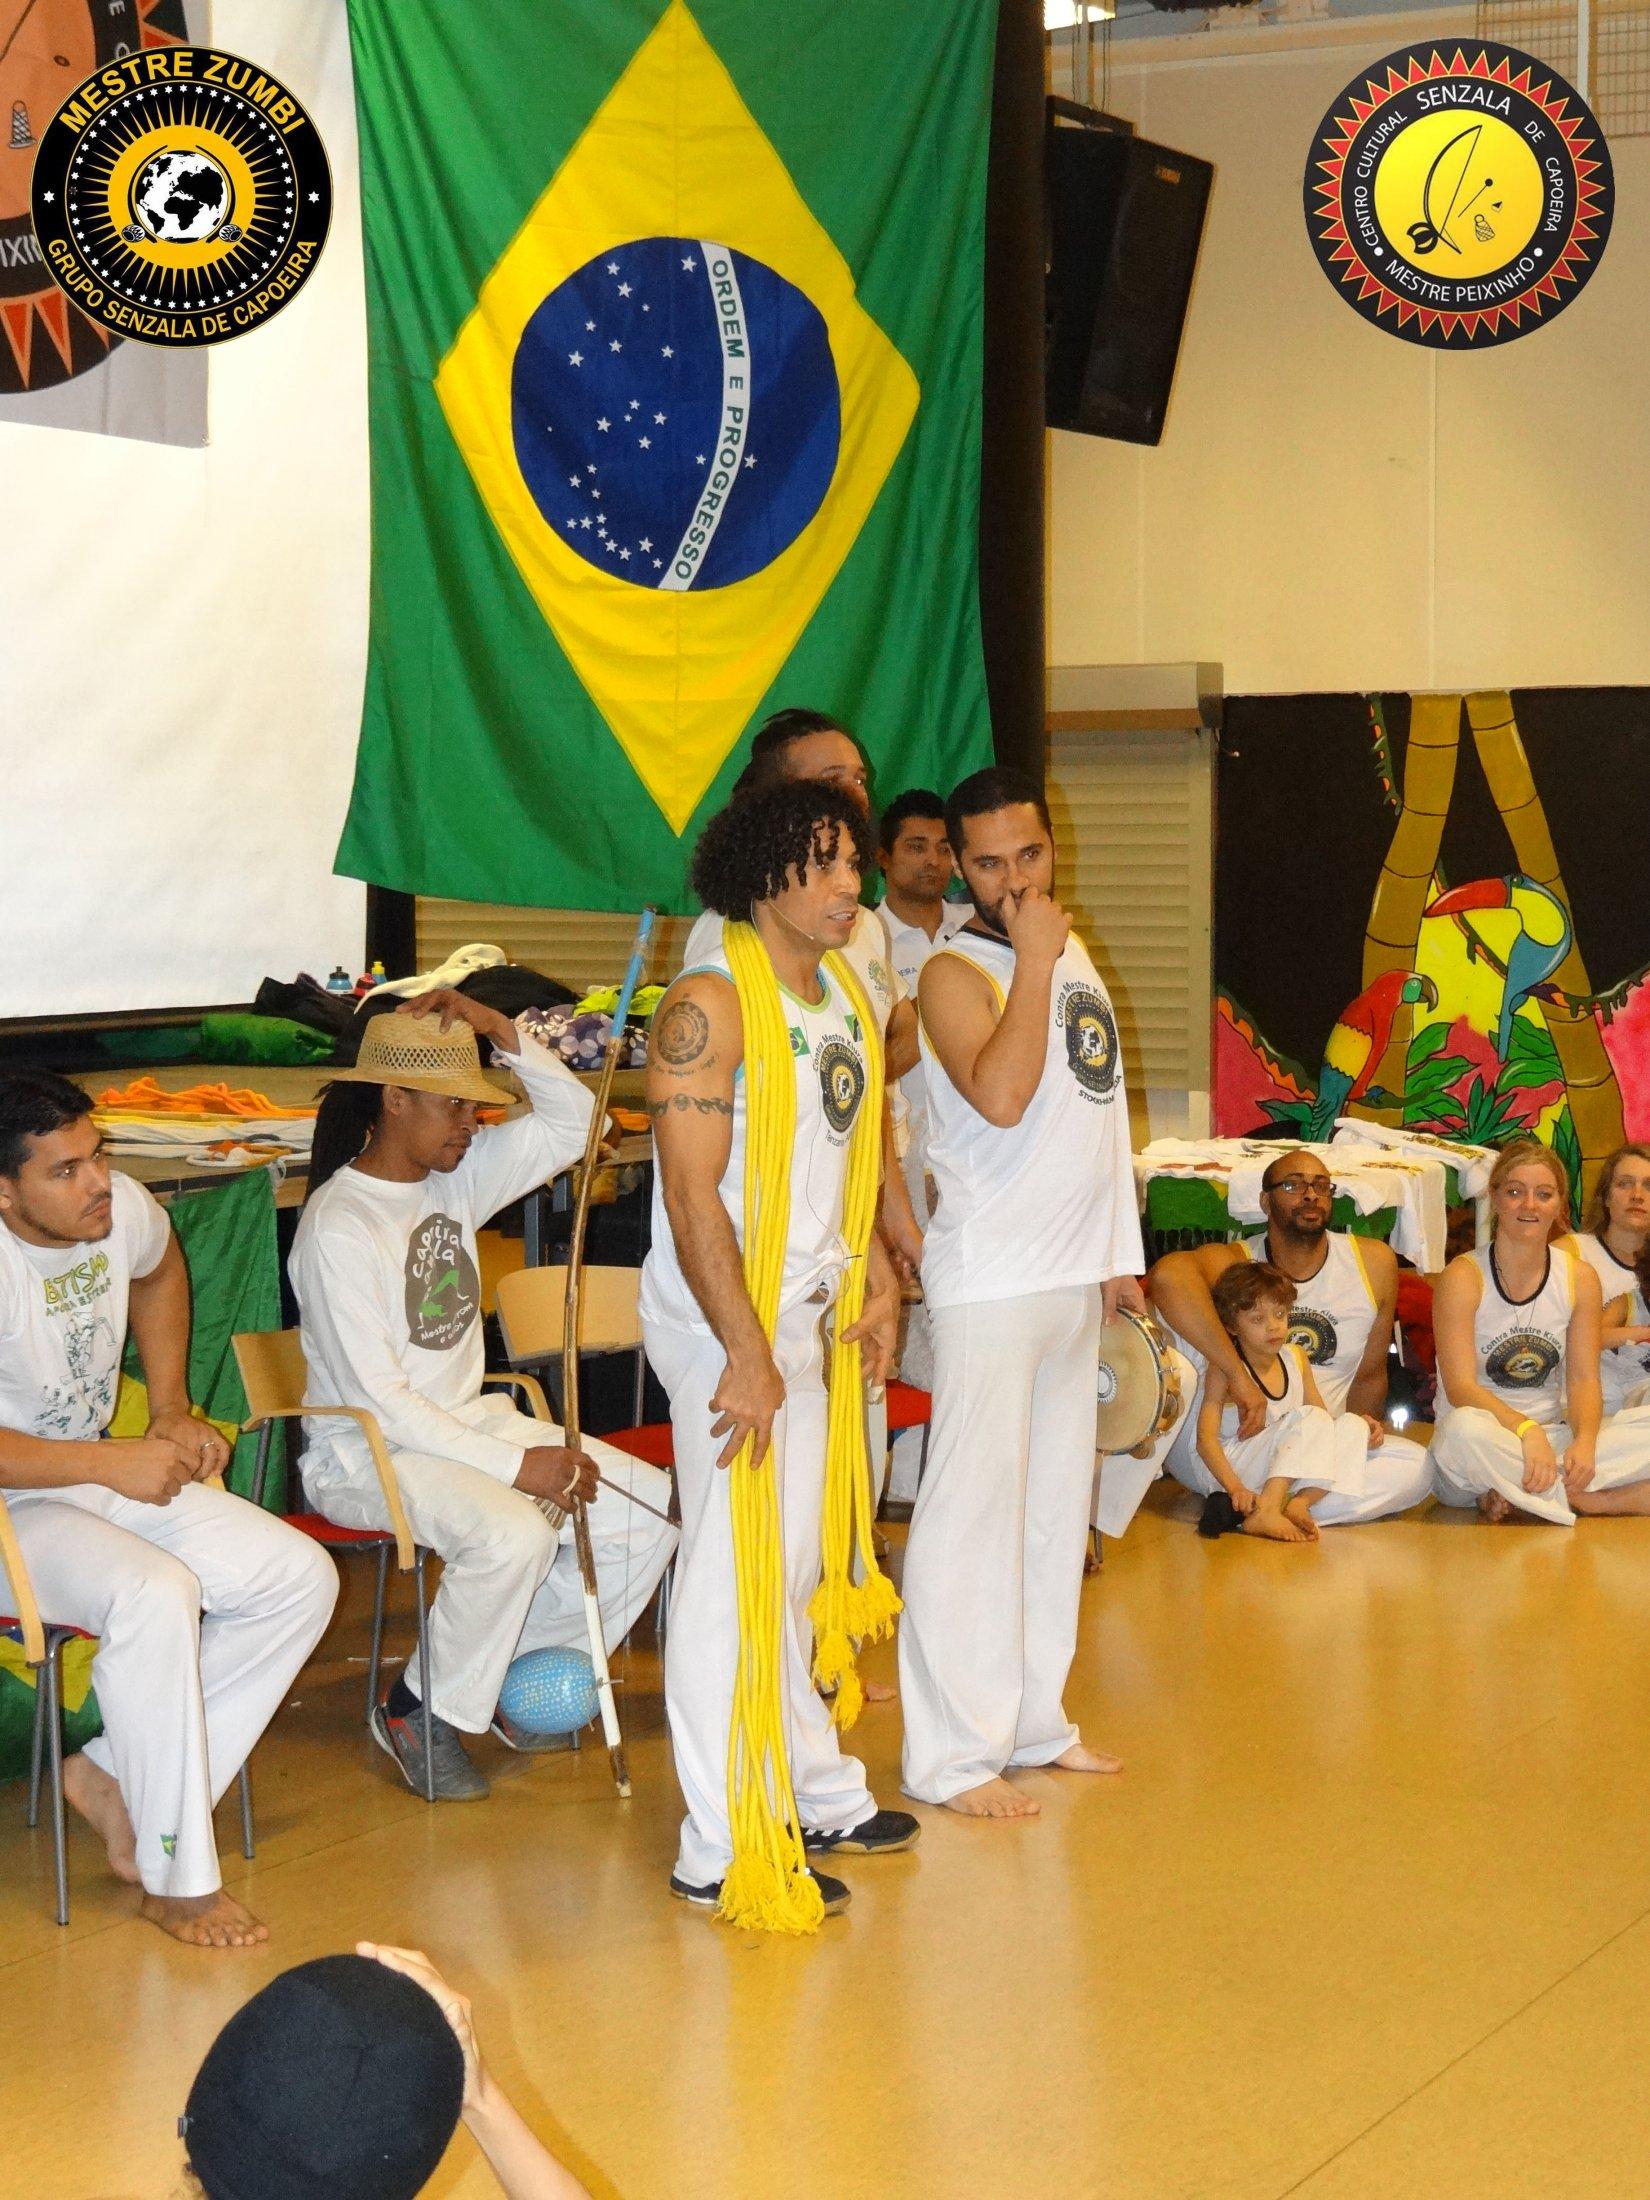 2013-12-14 - Capoeira 051